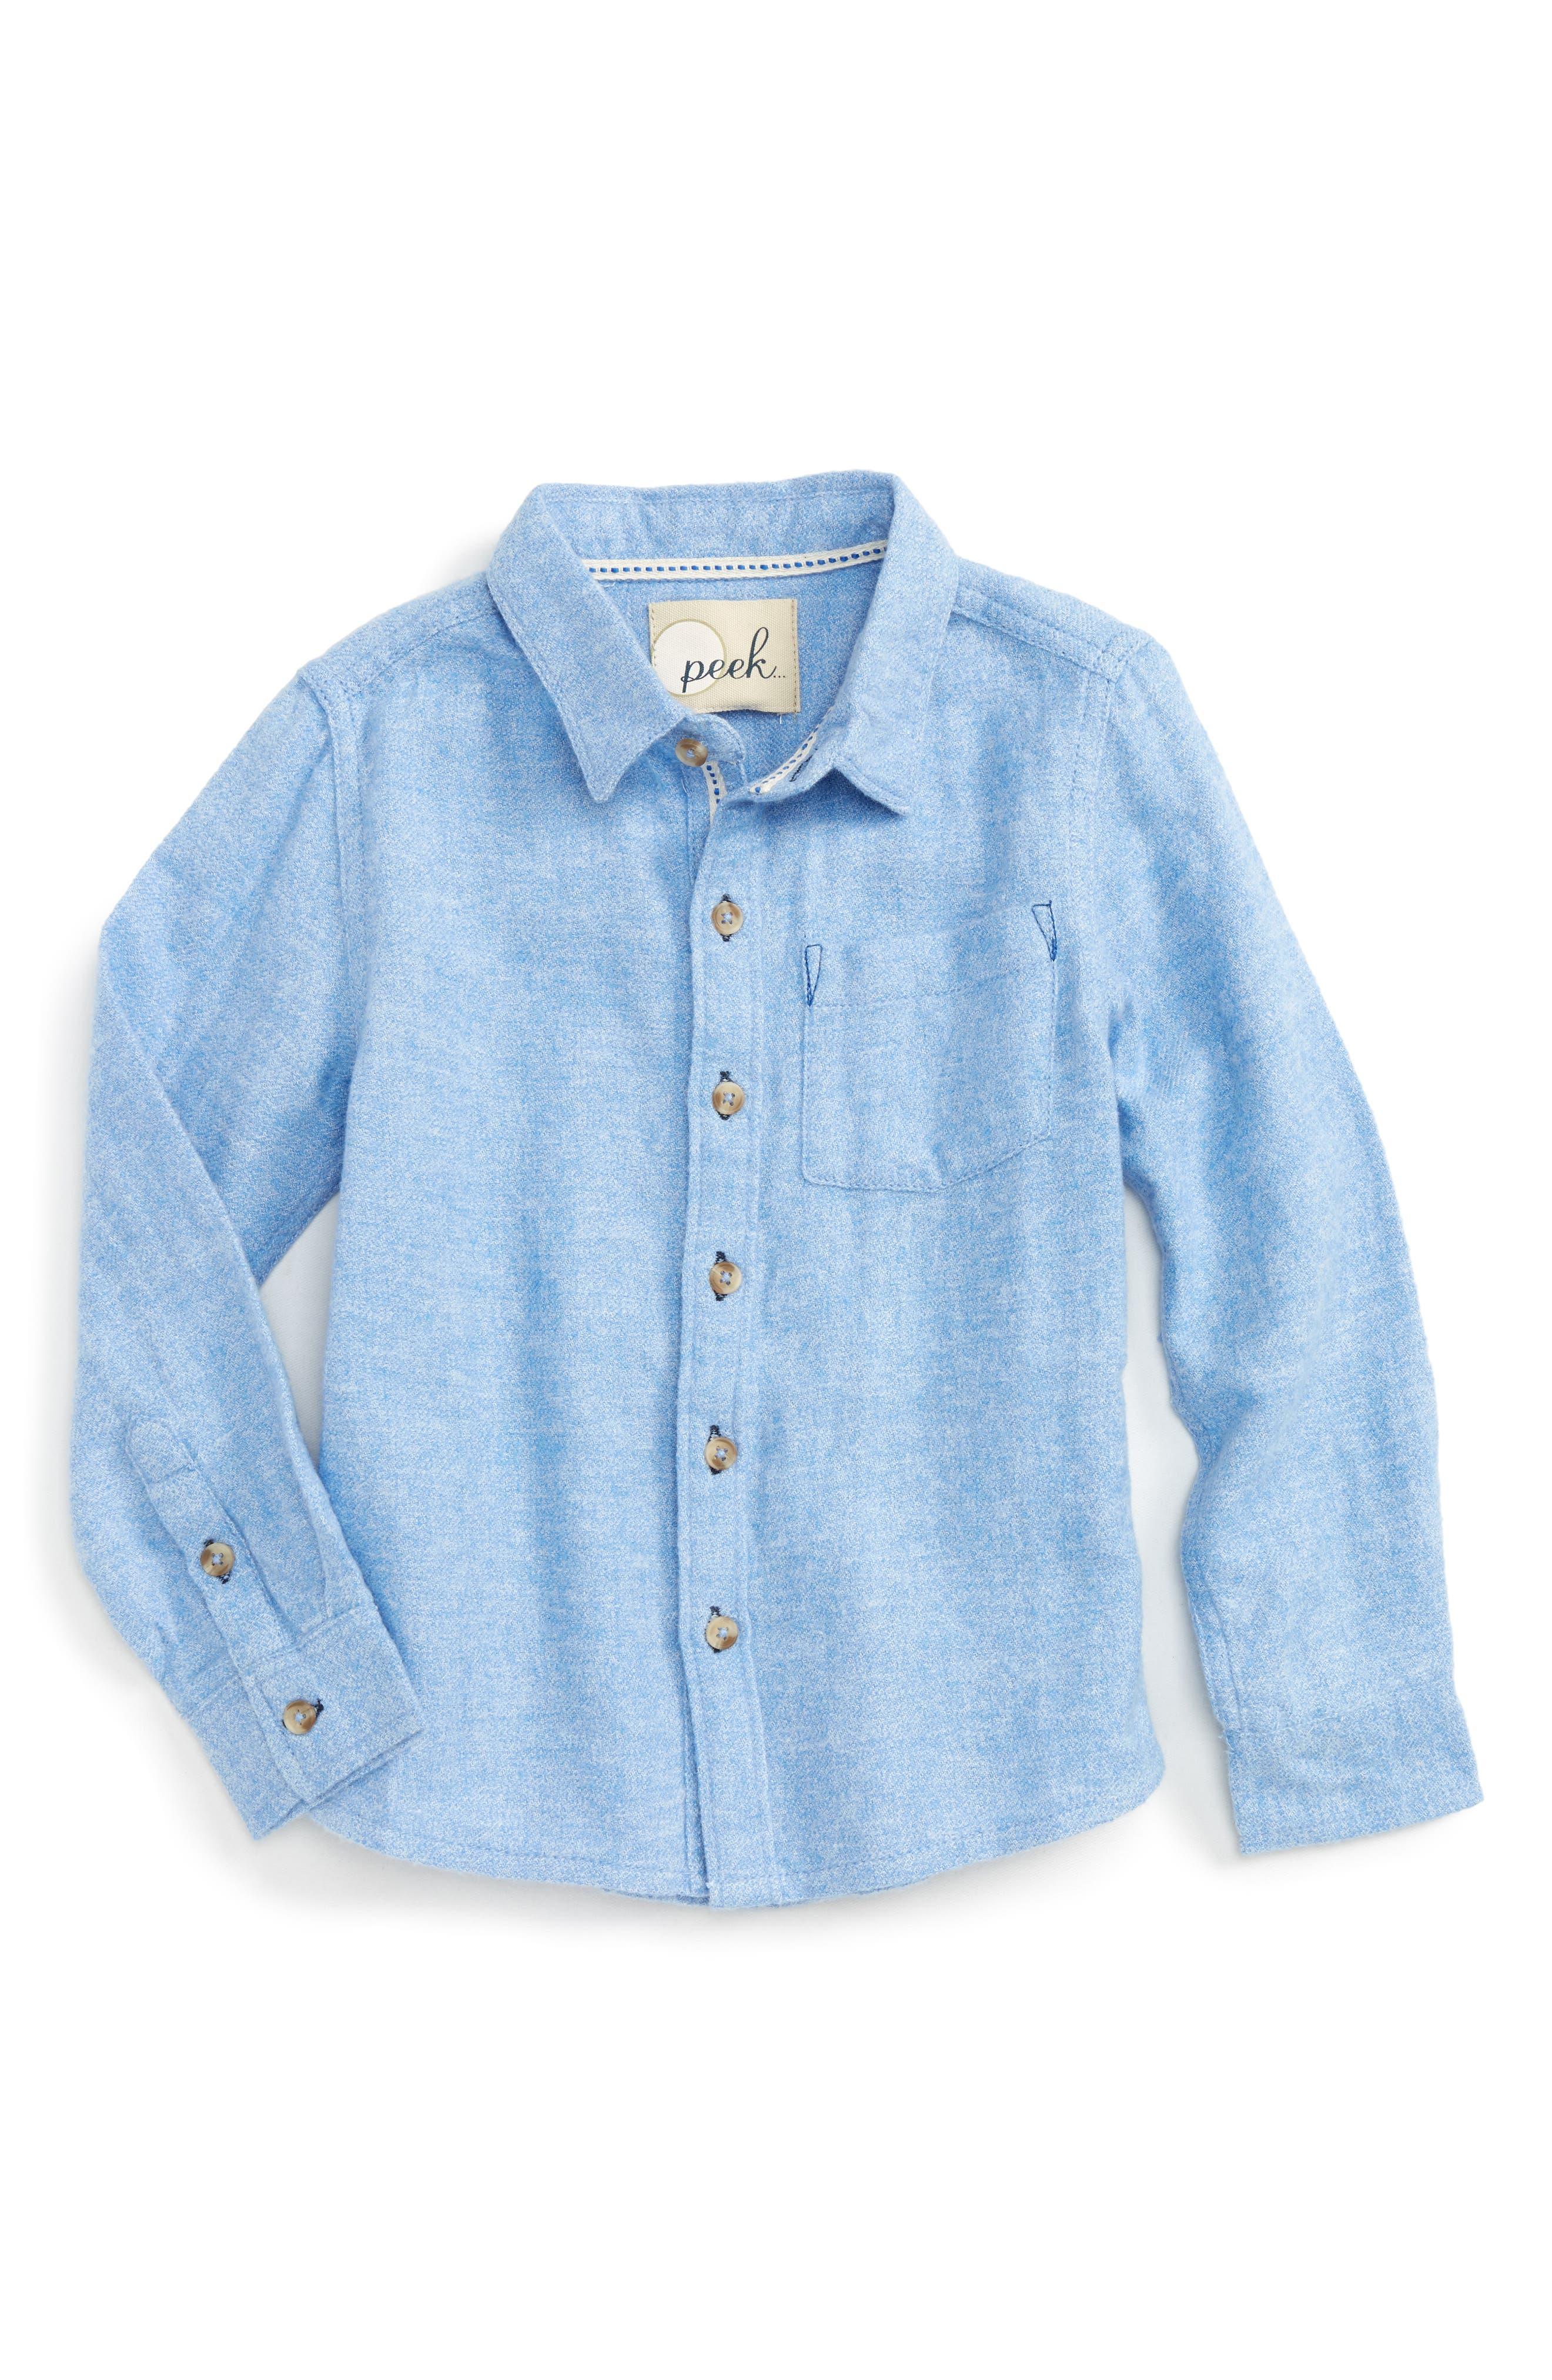 James Woven Flannel Shirt,                             Main thumbnail 1, color,                             452